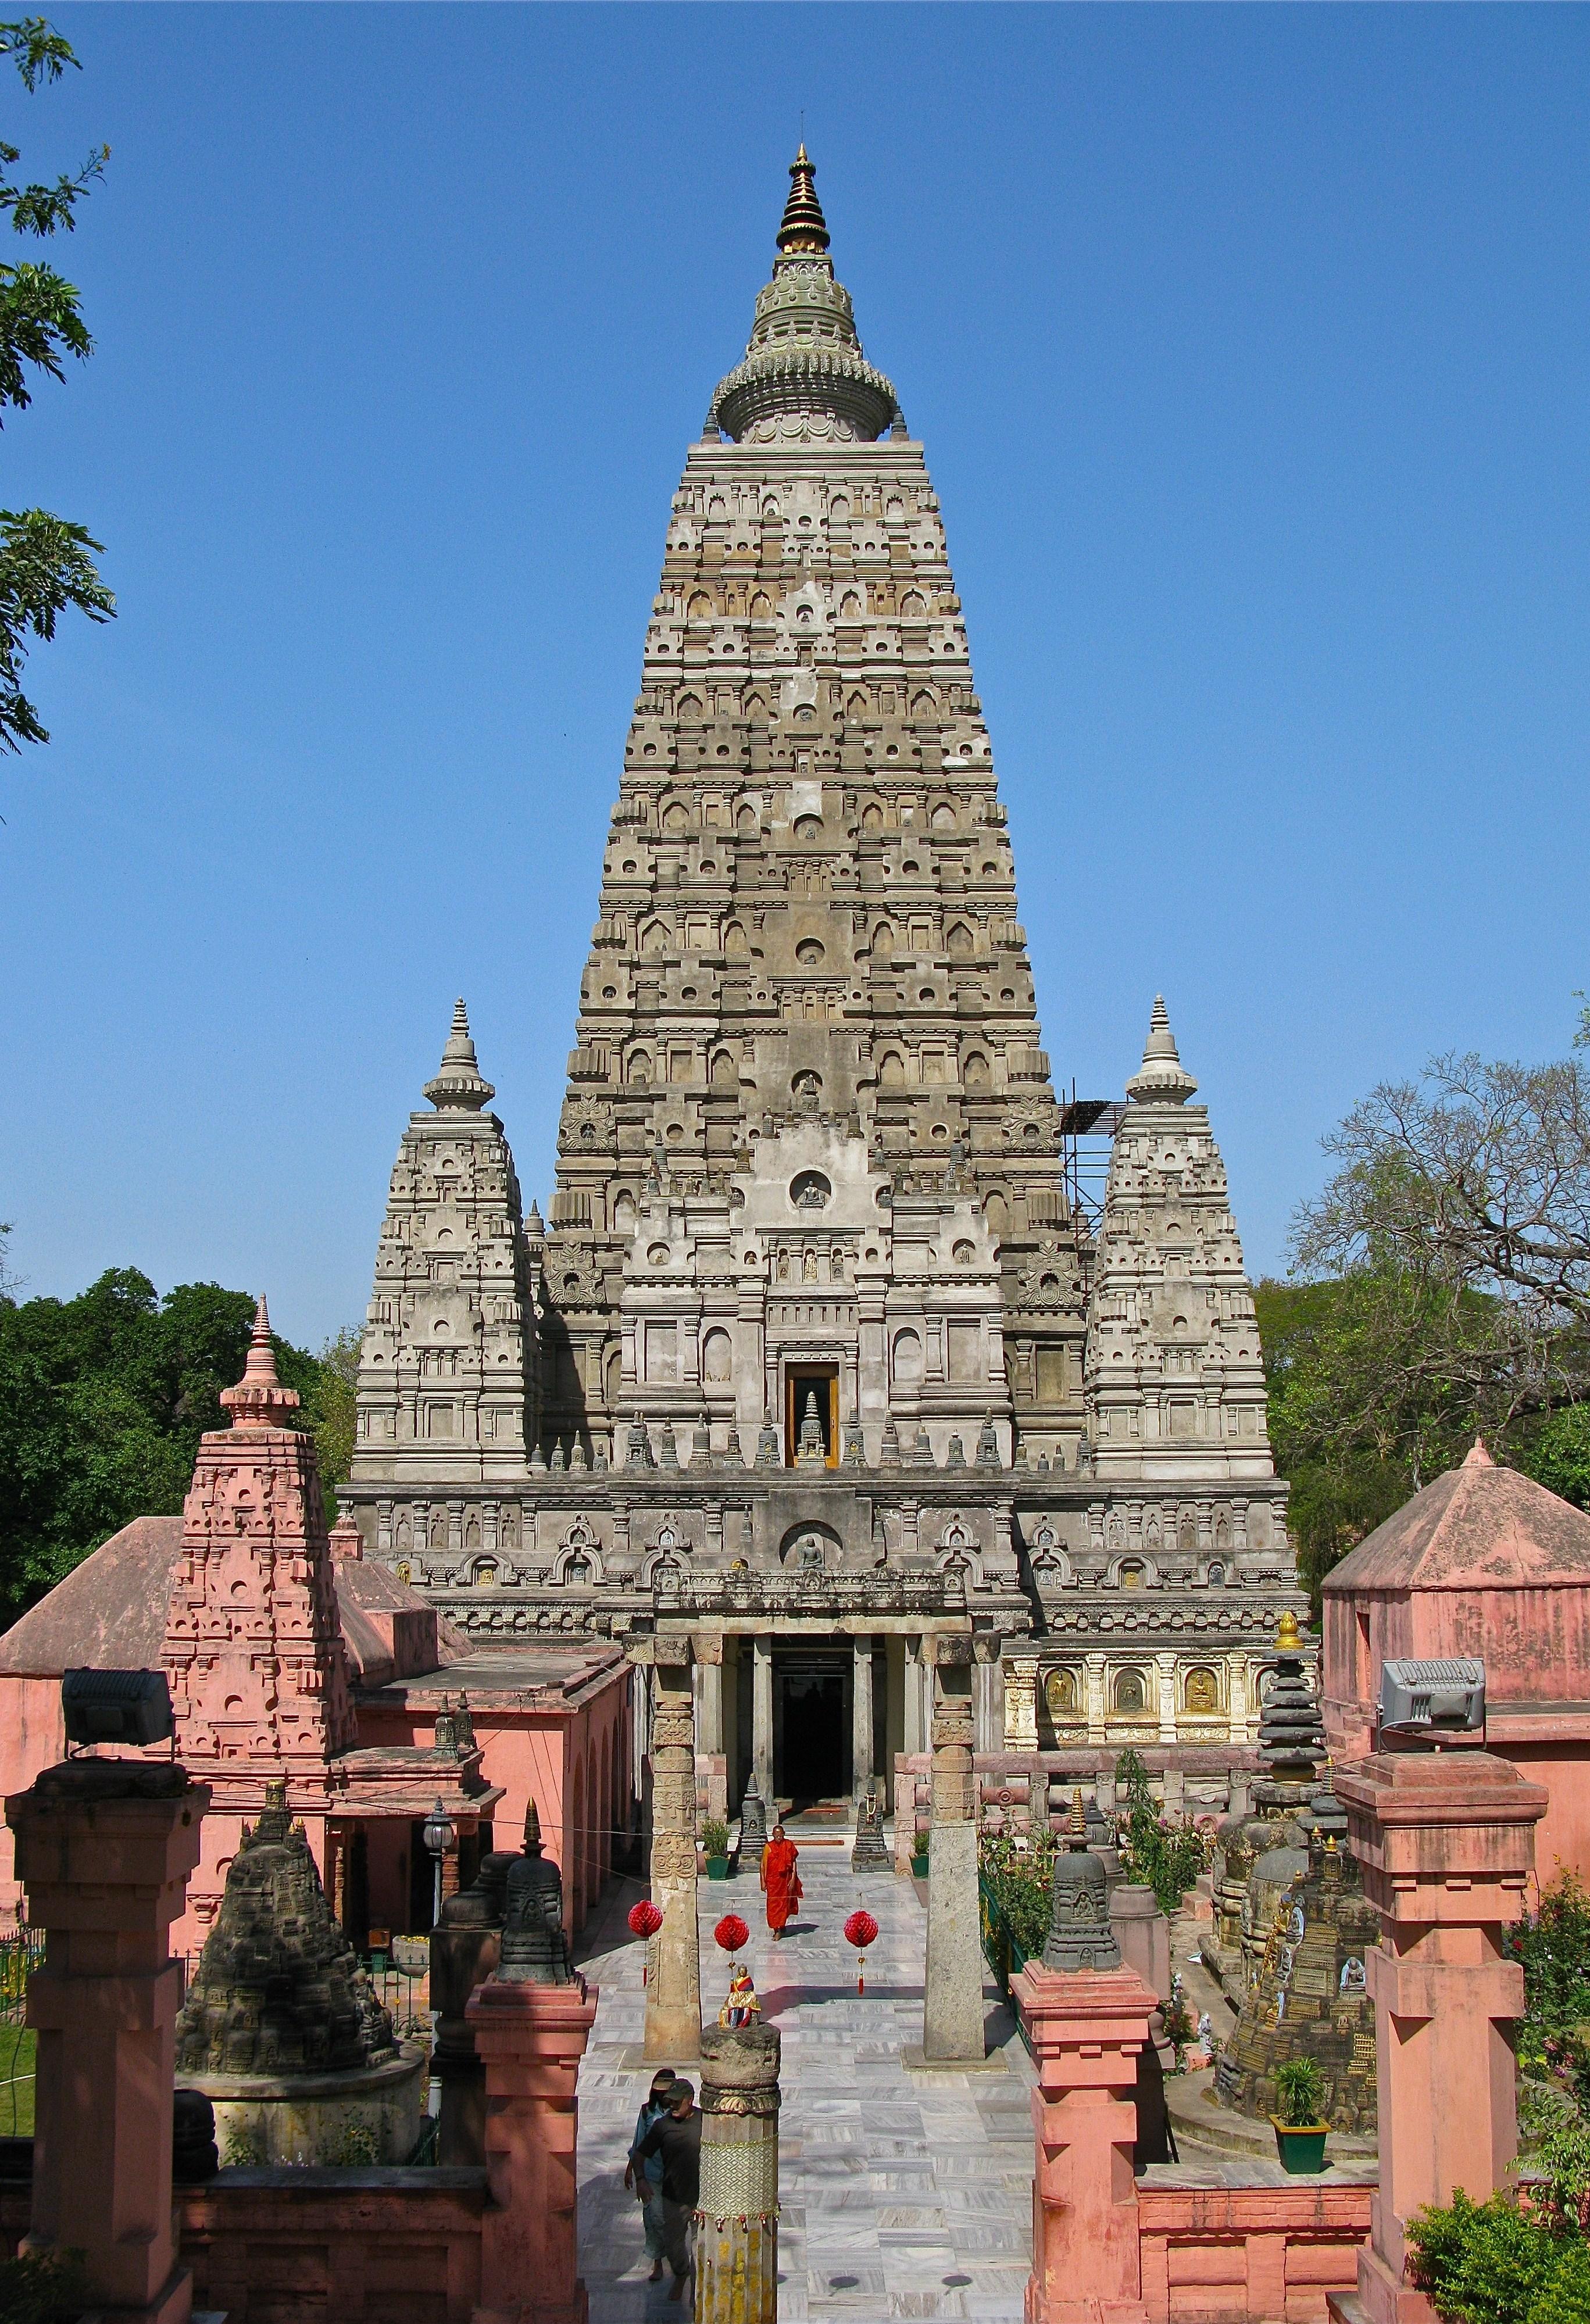 Gaya India  city pictures gallery : Mahabodhi Temple Bodh Gaya Bihar India Wikipedia, the free ...